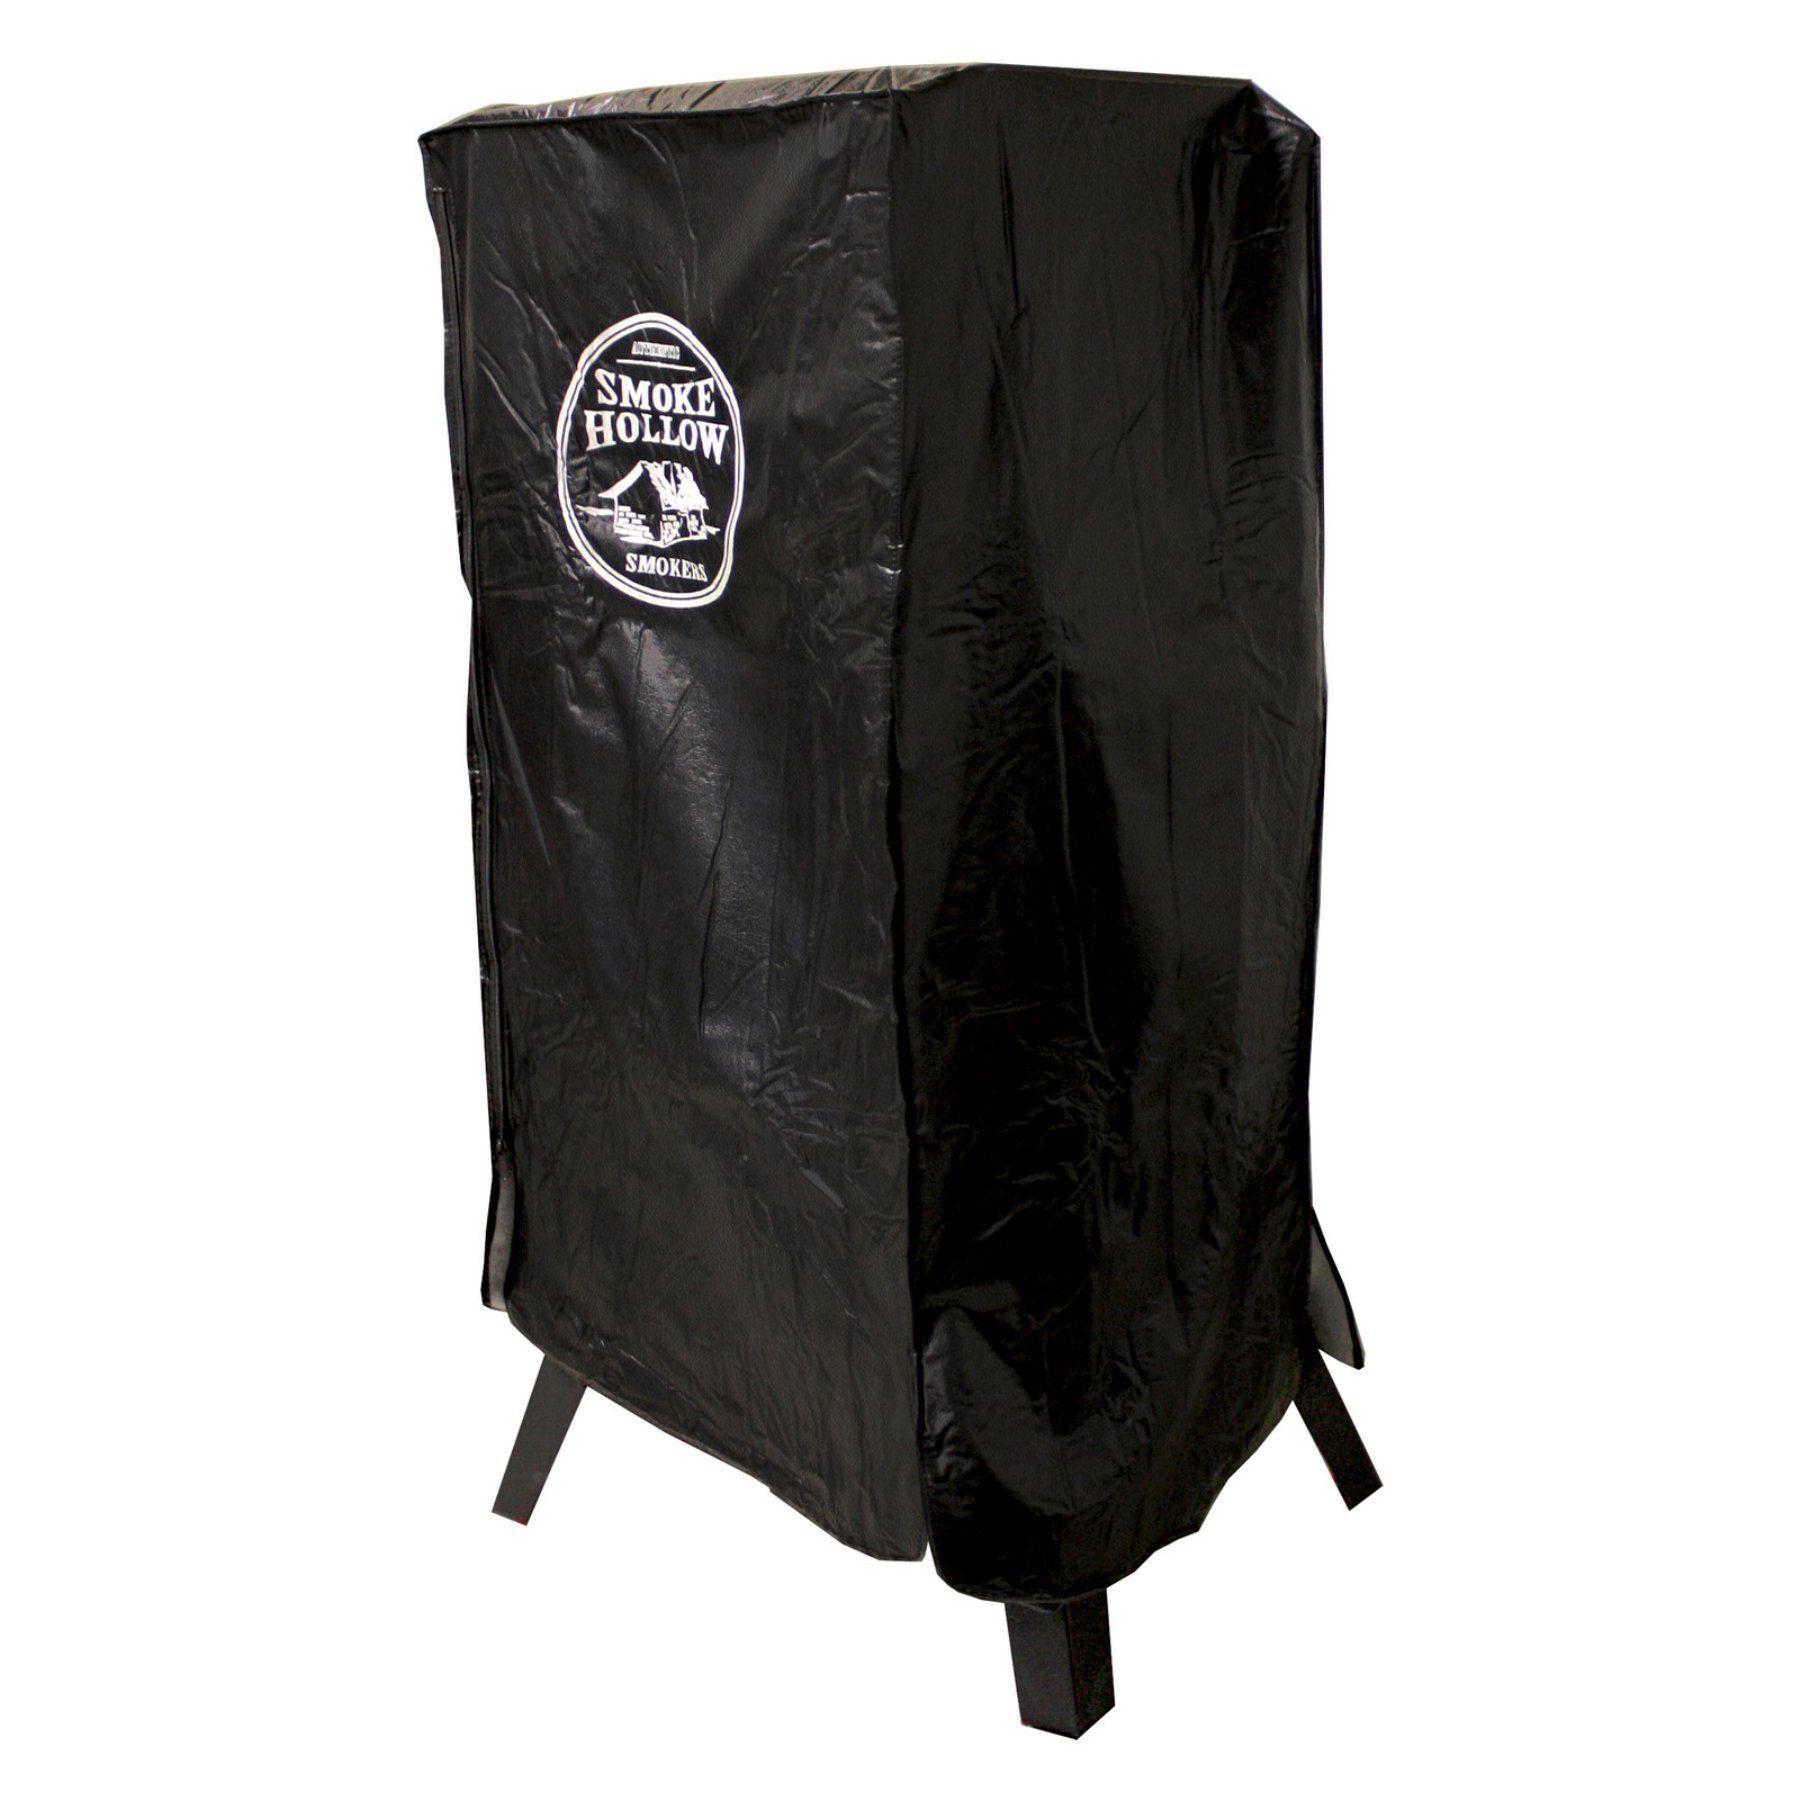 Smoke Hollow SC38 Heavy Duty Water Resistant PVC Smoker Cover SC38